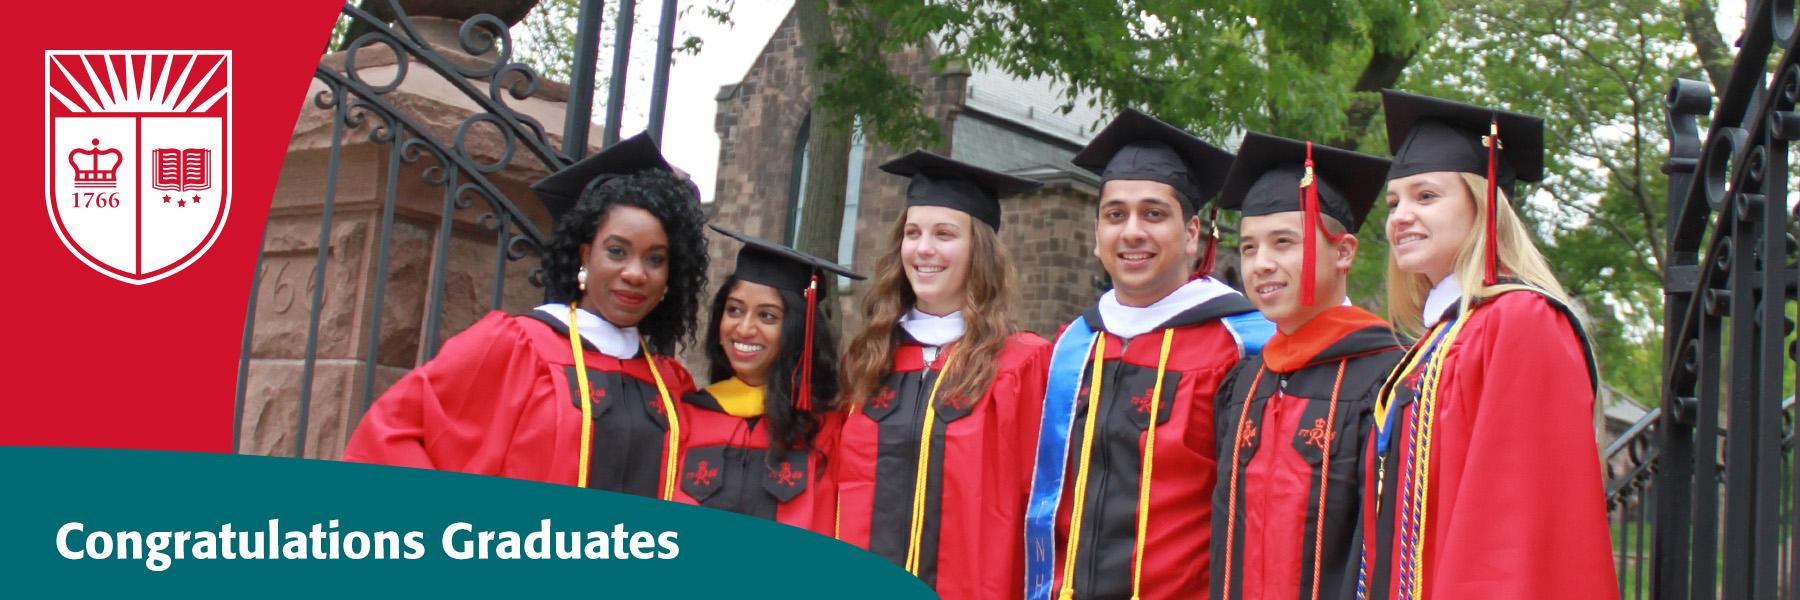 School of Arts and Sciences Graduates